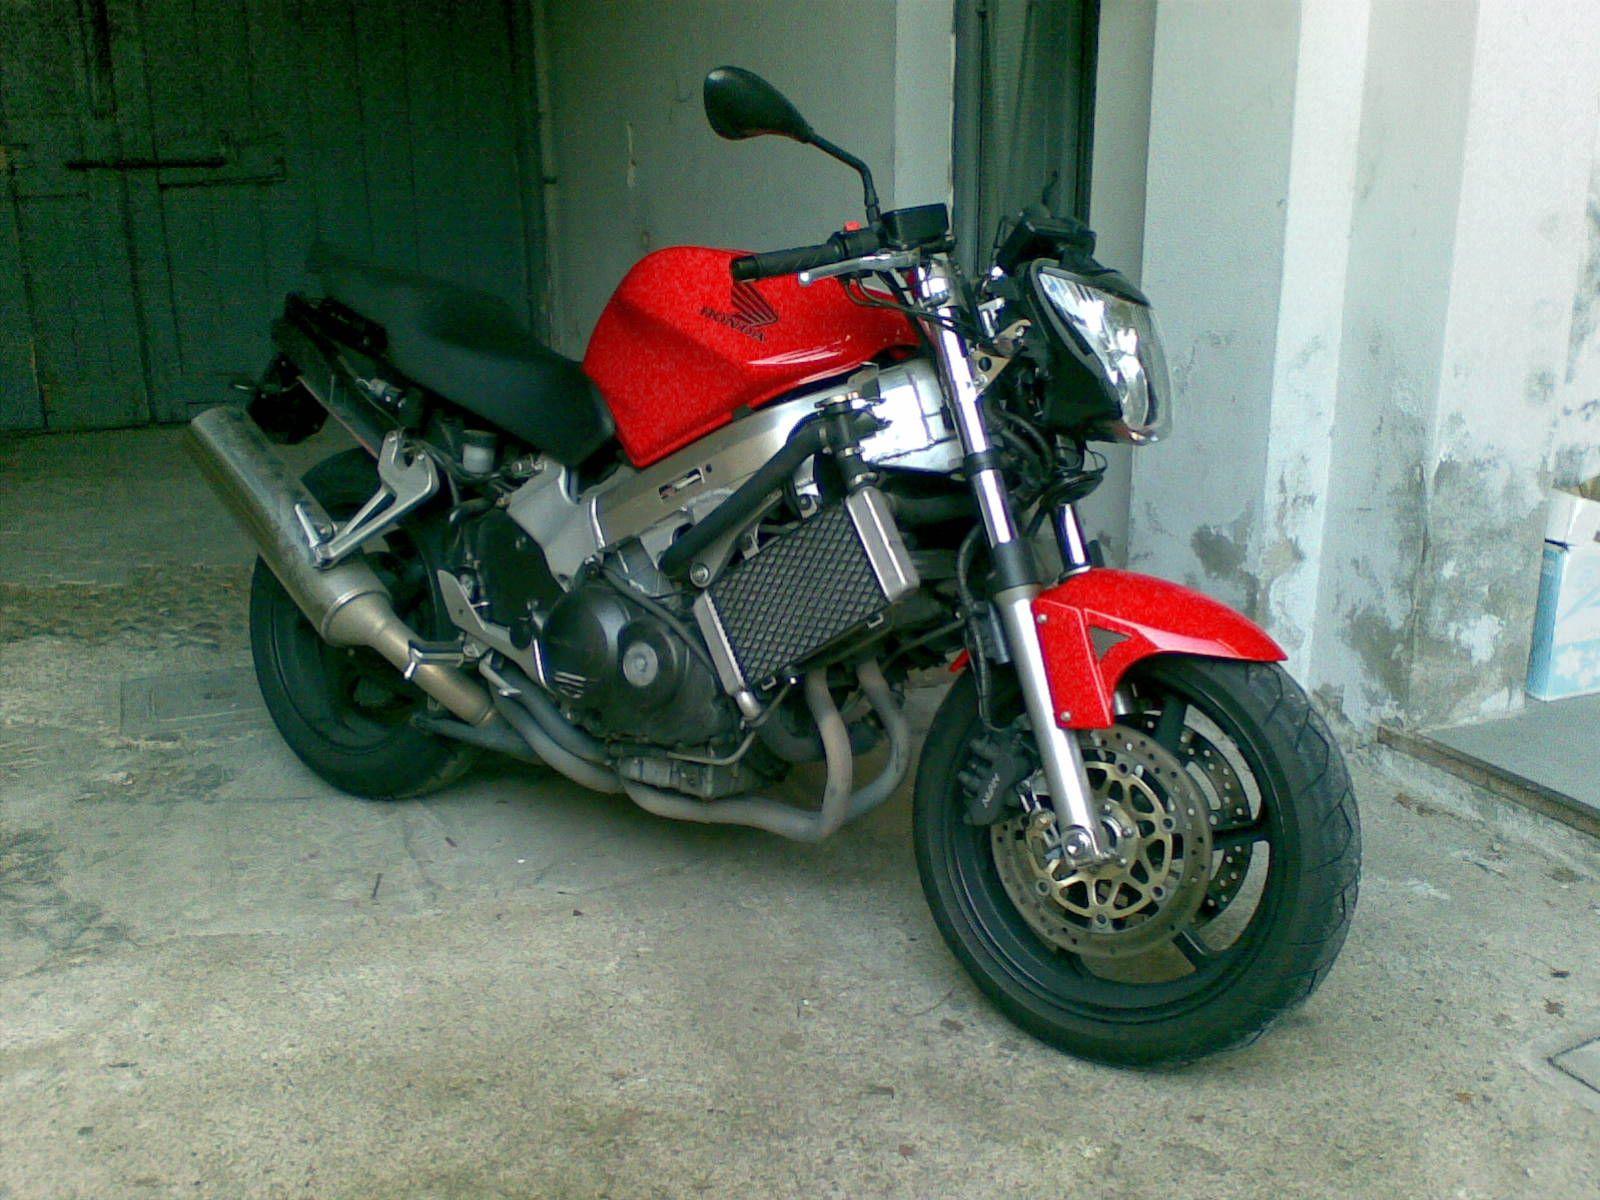 Vfr 800 FI => Naked => Streetfighter - Cafe Racer